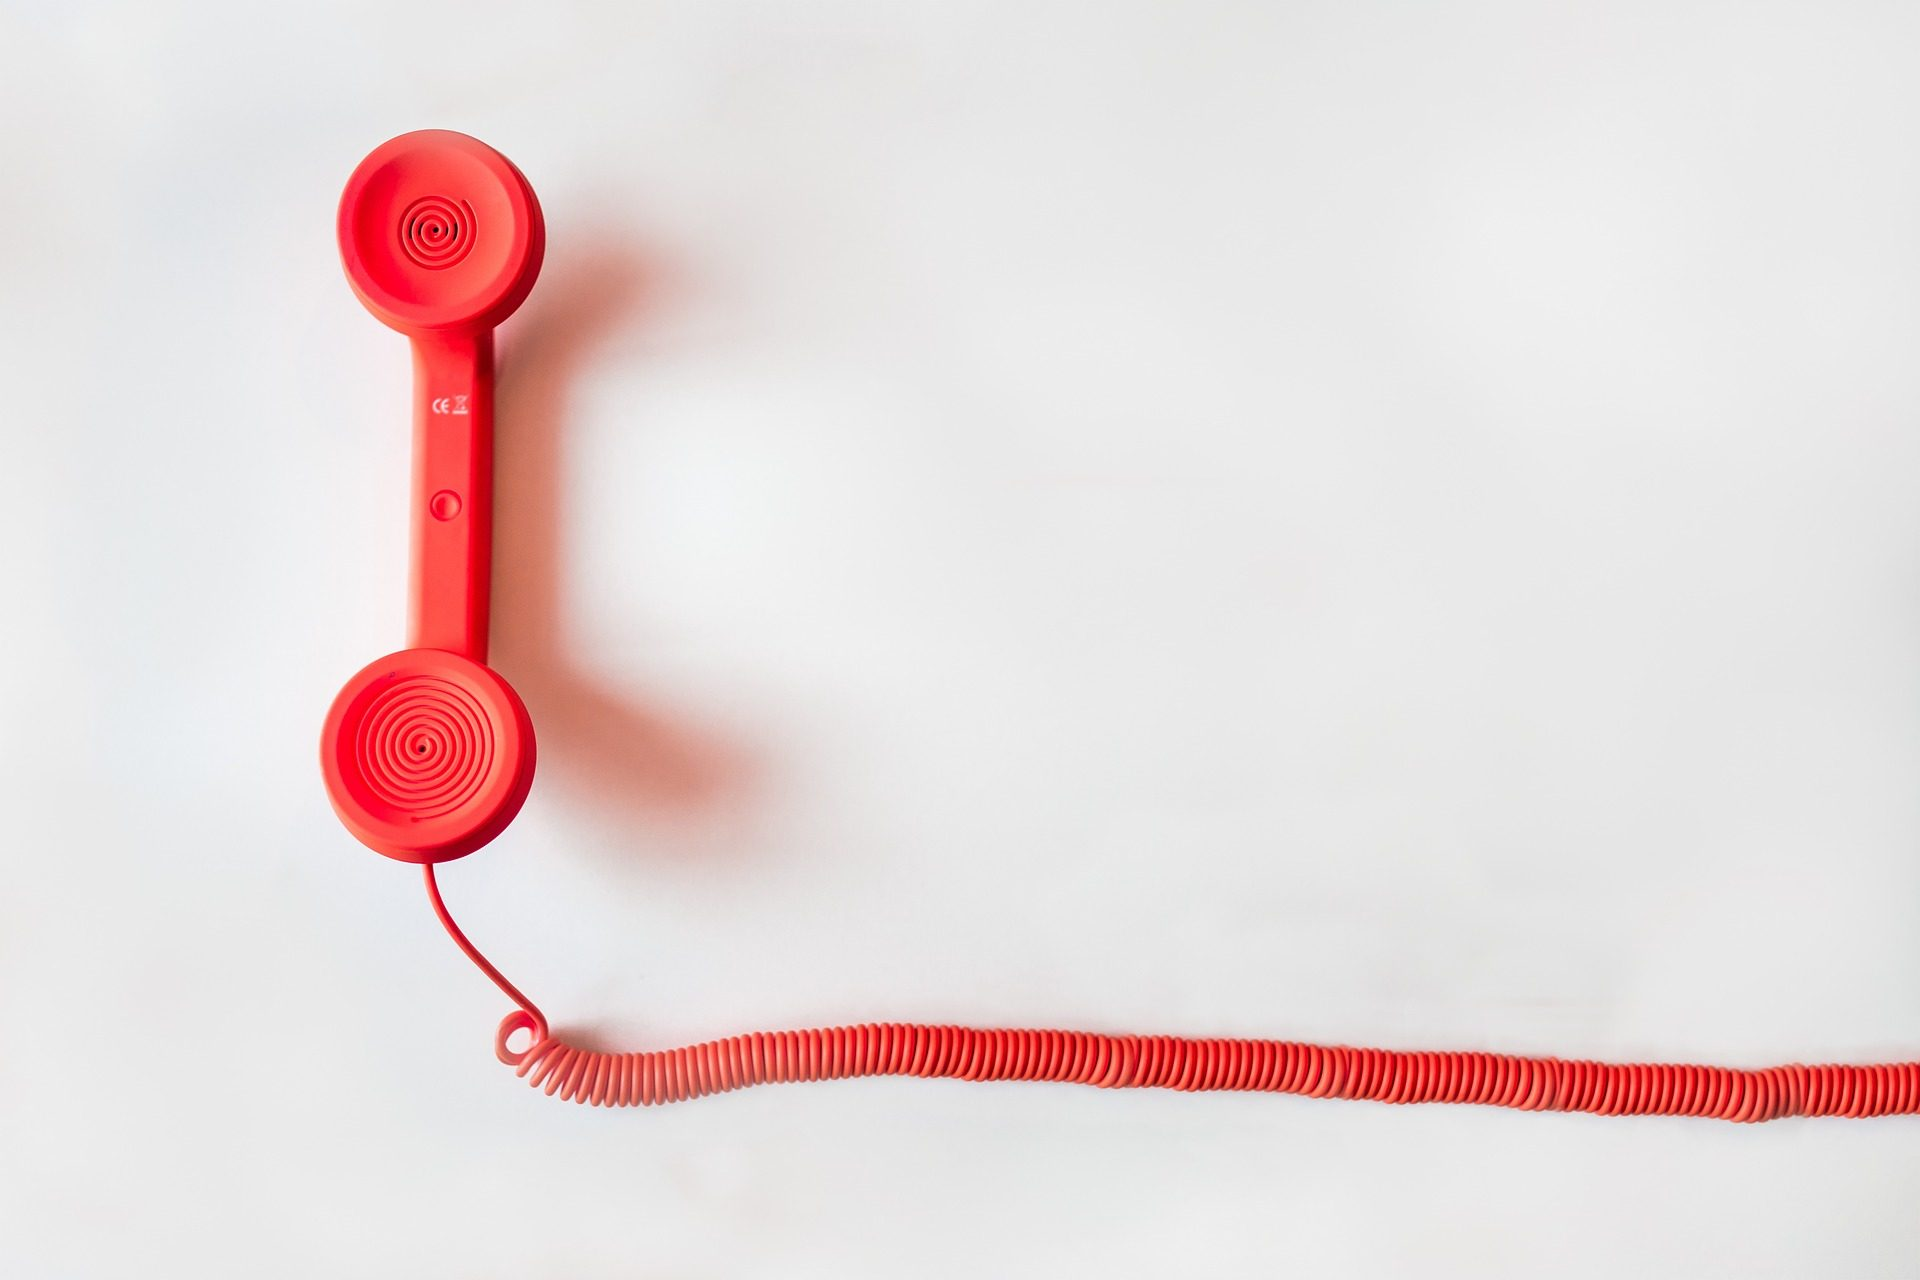 phone-2280940_1920